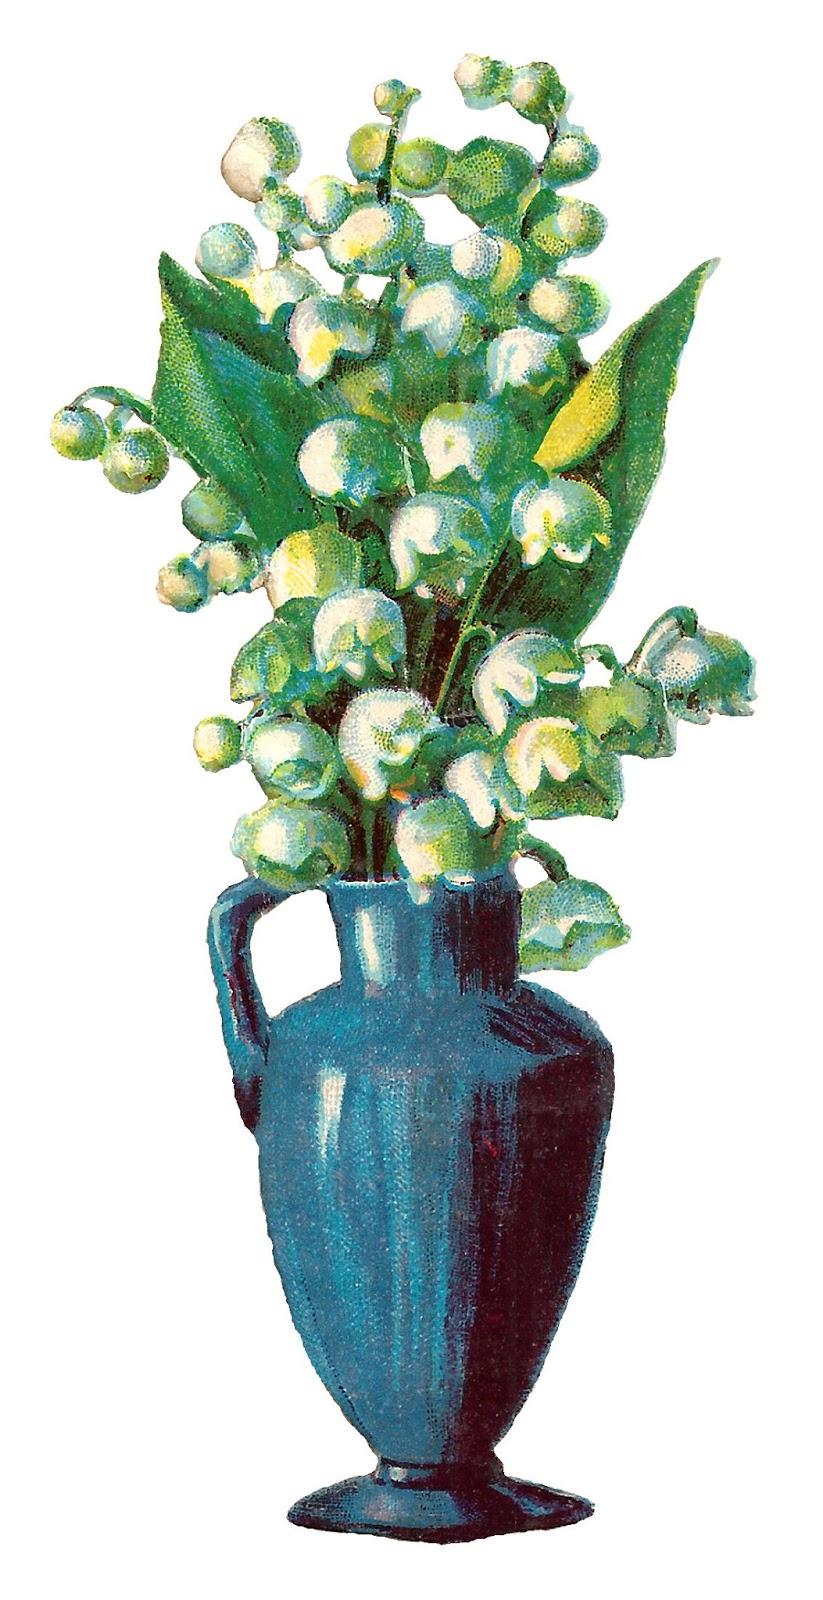 Antique images free printable flower vase wildflower artwork vintage flower vase clip art reviewsmspy